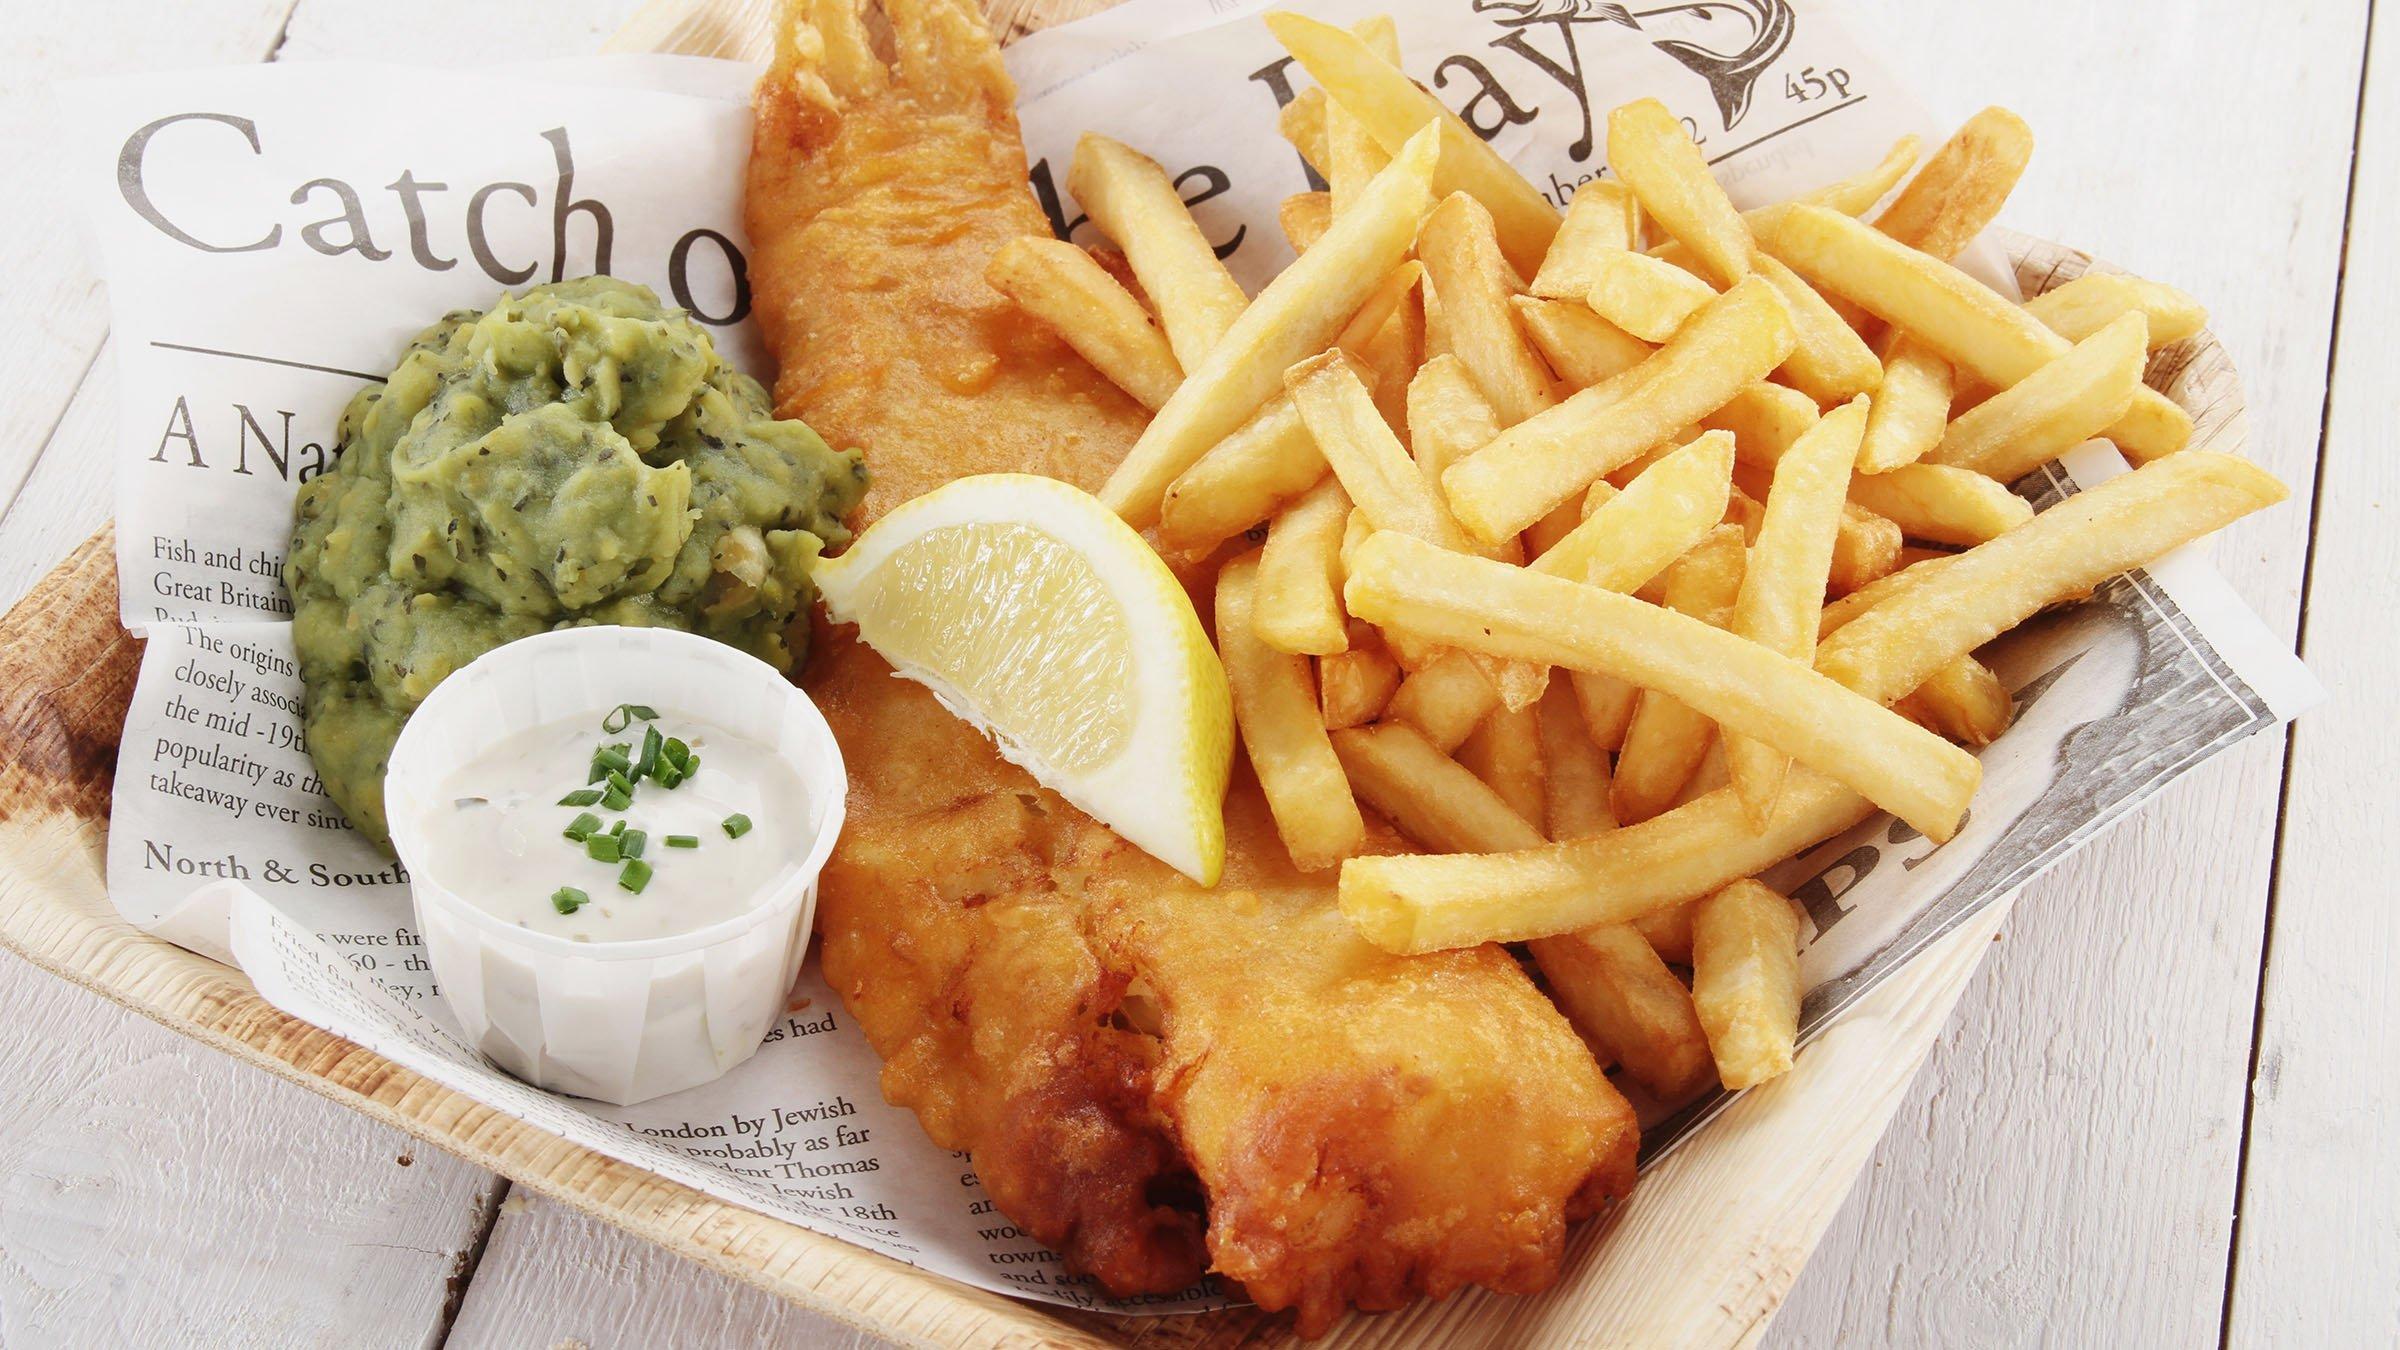 Fish and chips una opci n neozelandesa de comida r pida for Una comida rapida